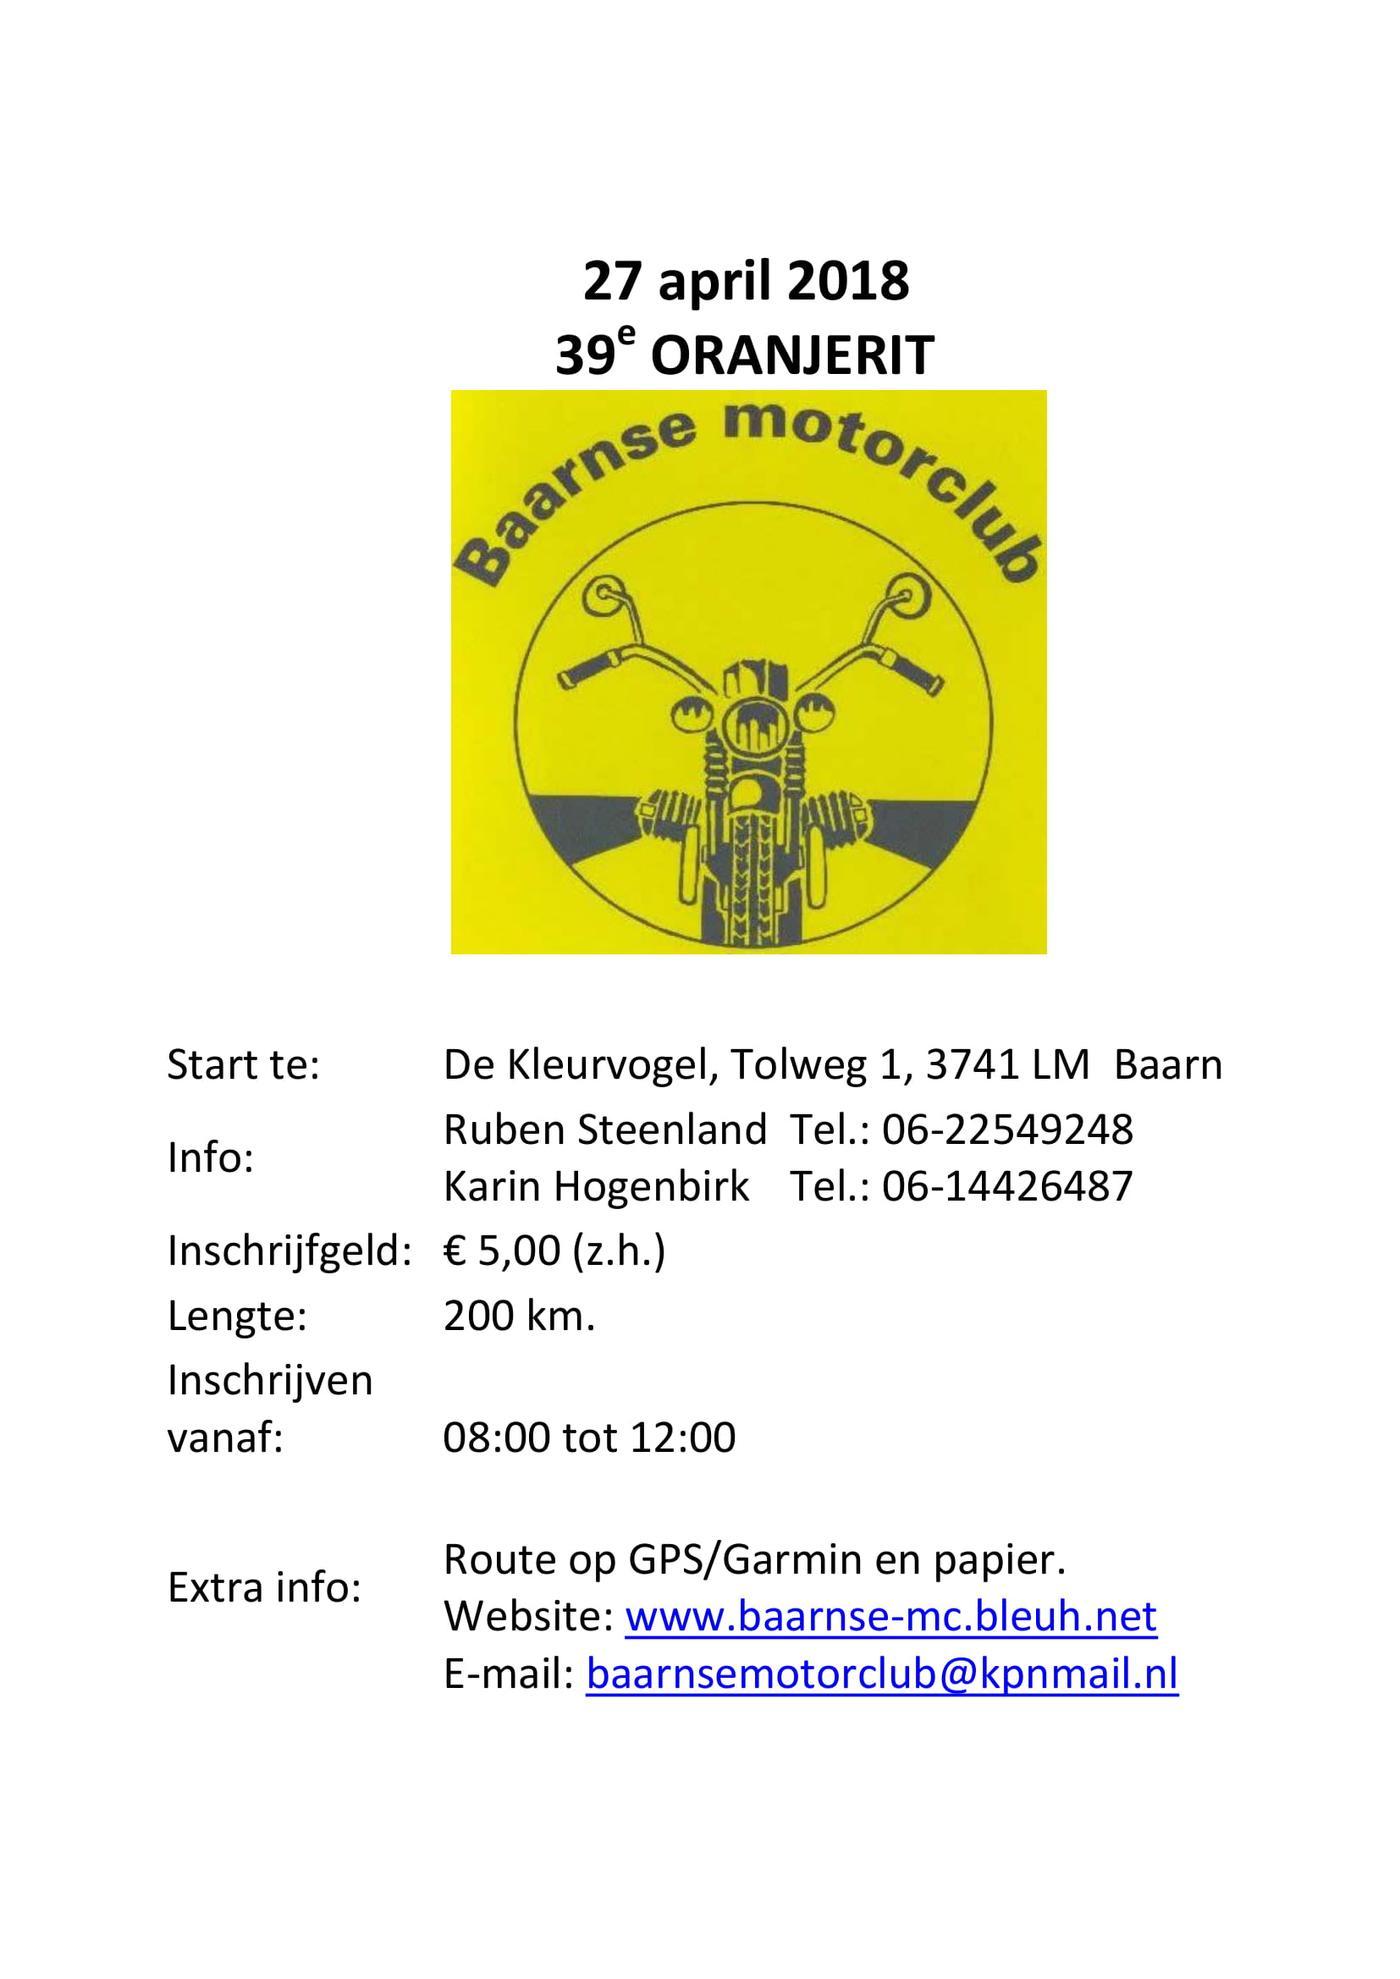 39e_ORANJERIT_-_BAARNSE_MOTOR_CLUB-1.jpg